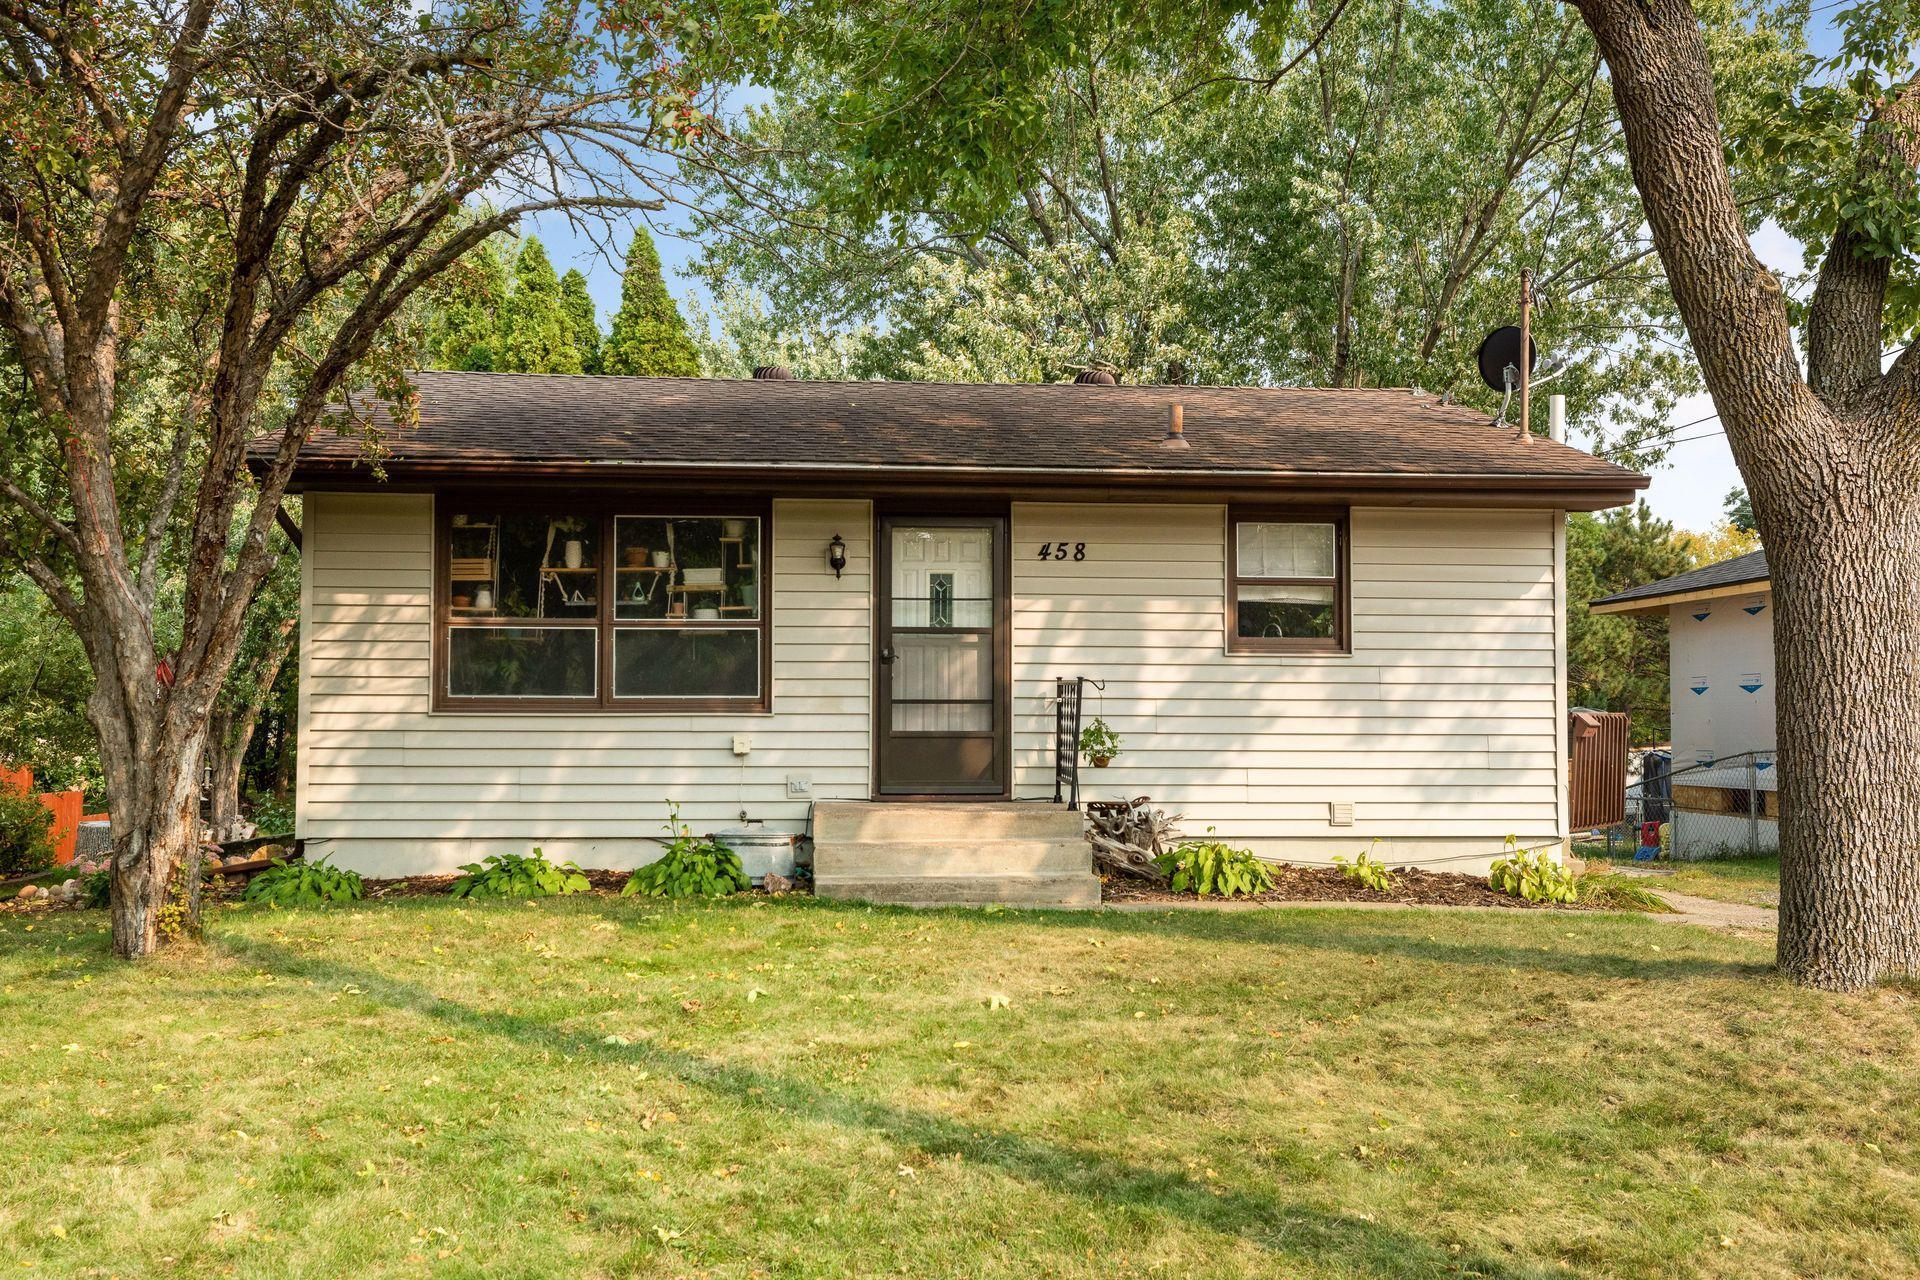 458 Perro Creek Drive Property Photo - Bayport, MN real estate listing